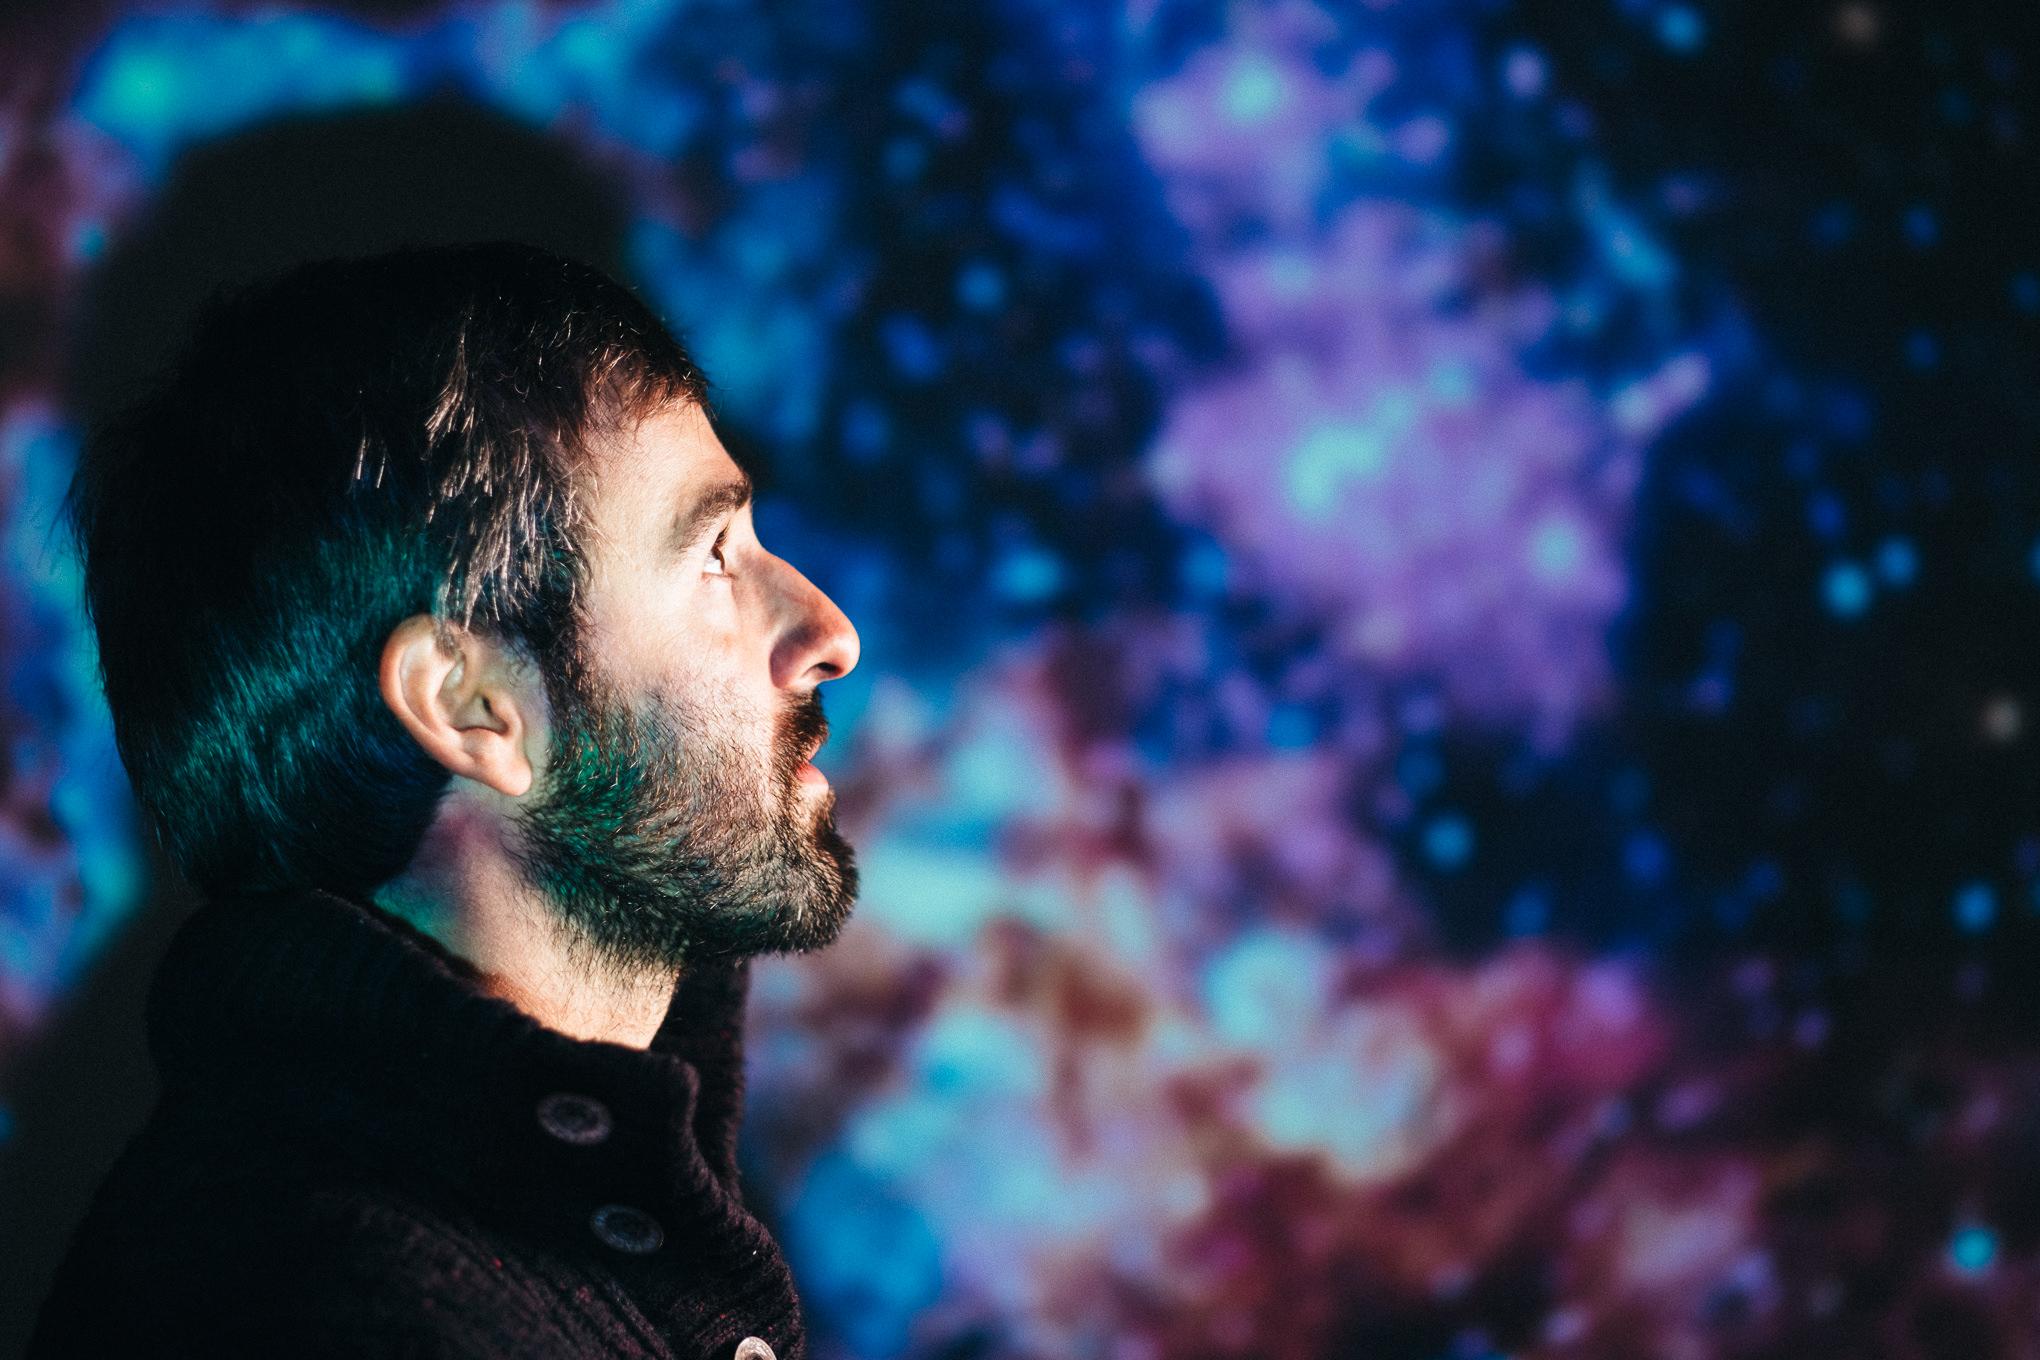 Sam Yoffe. Scientist, Photographer